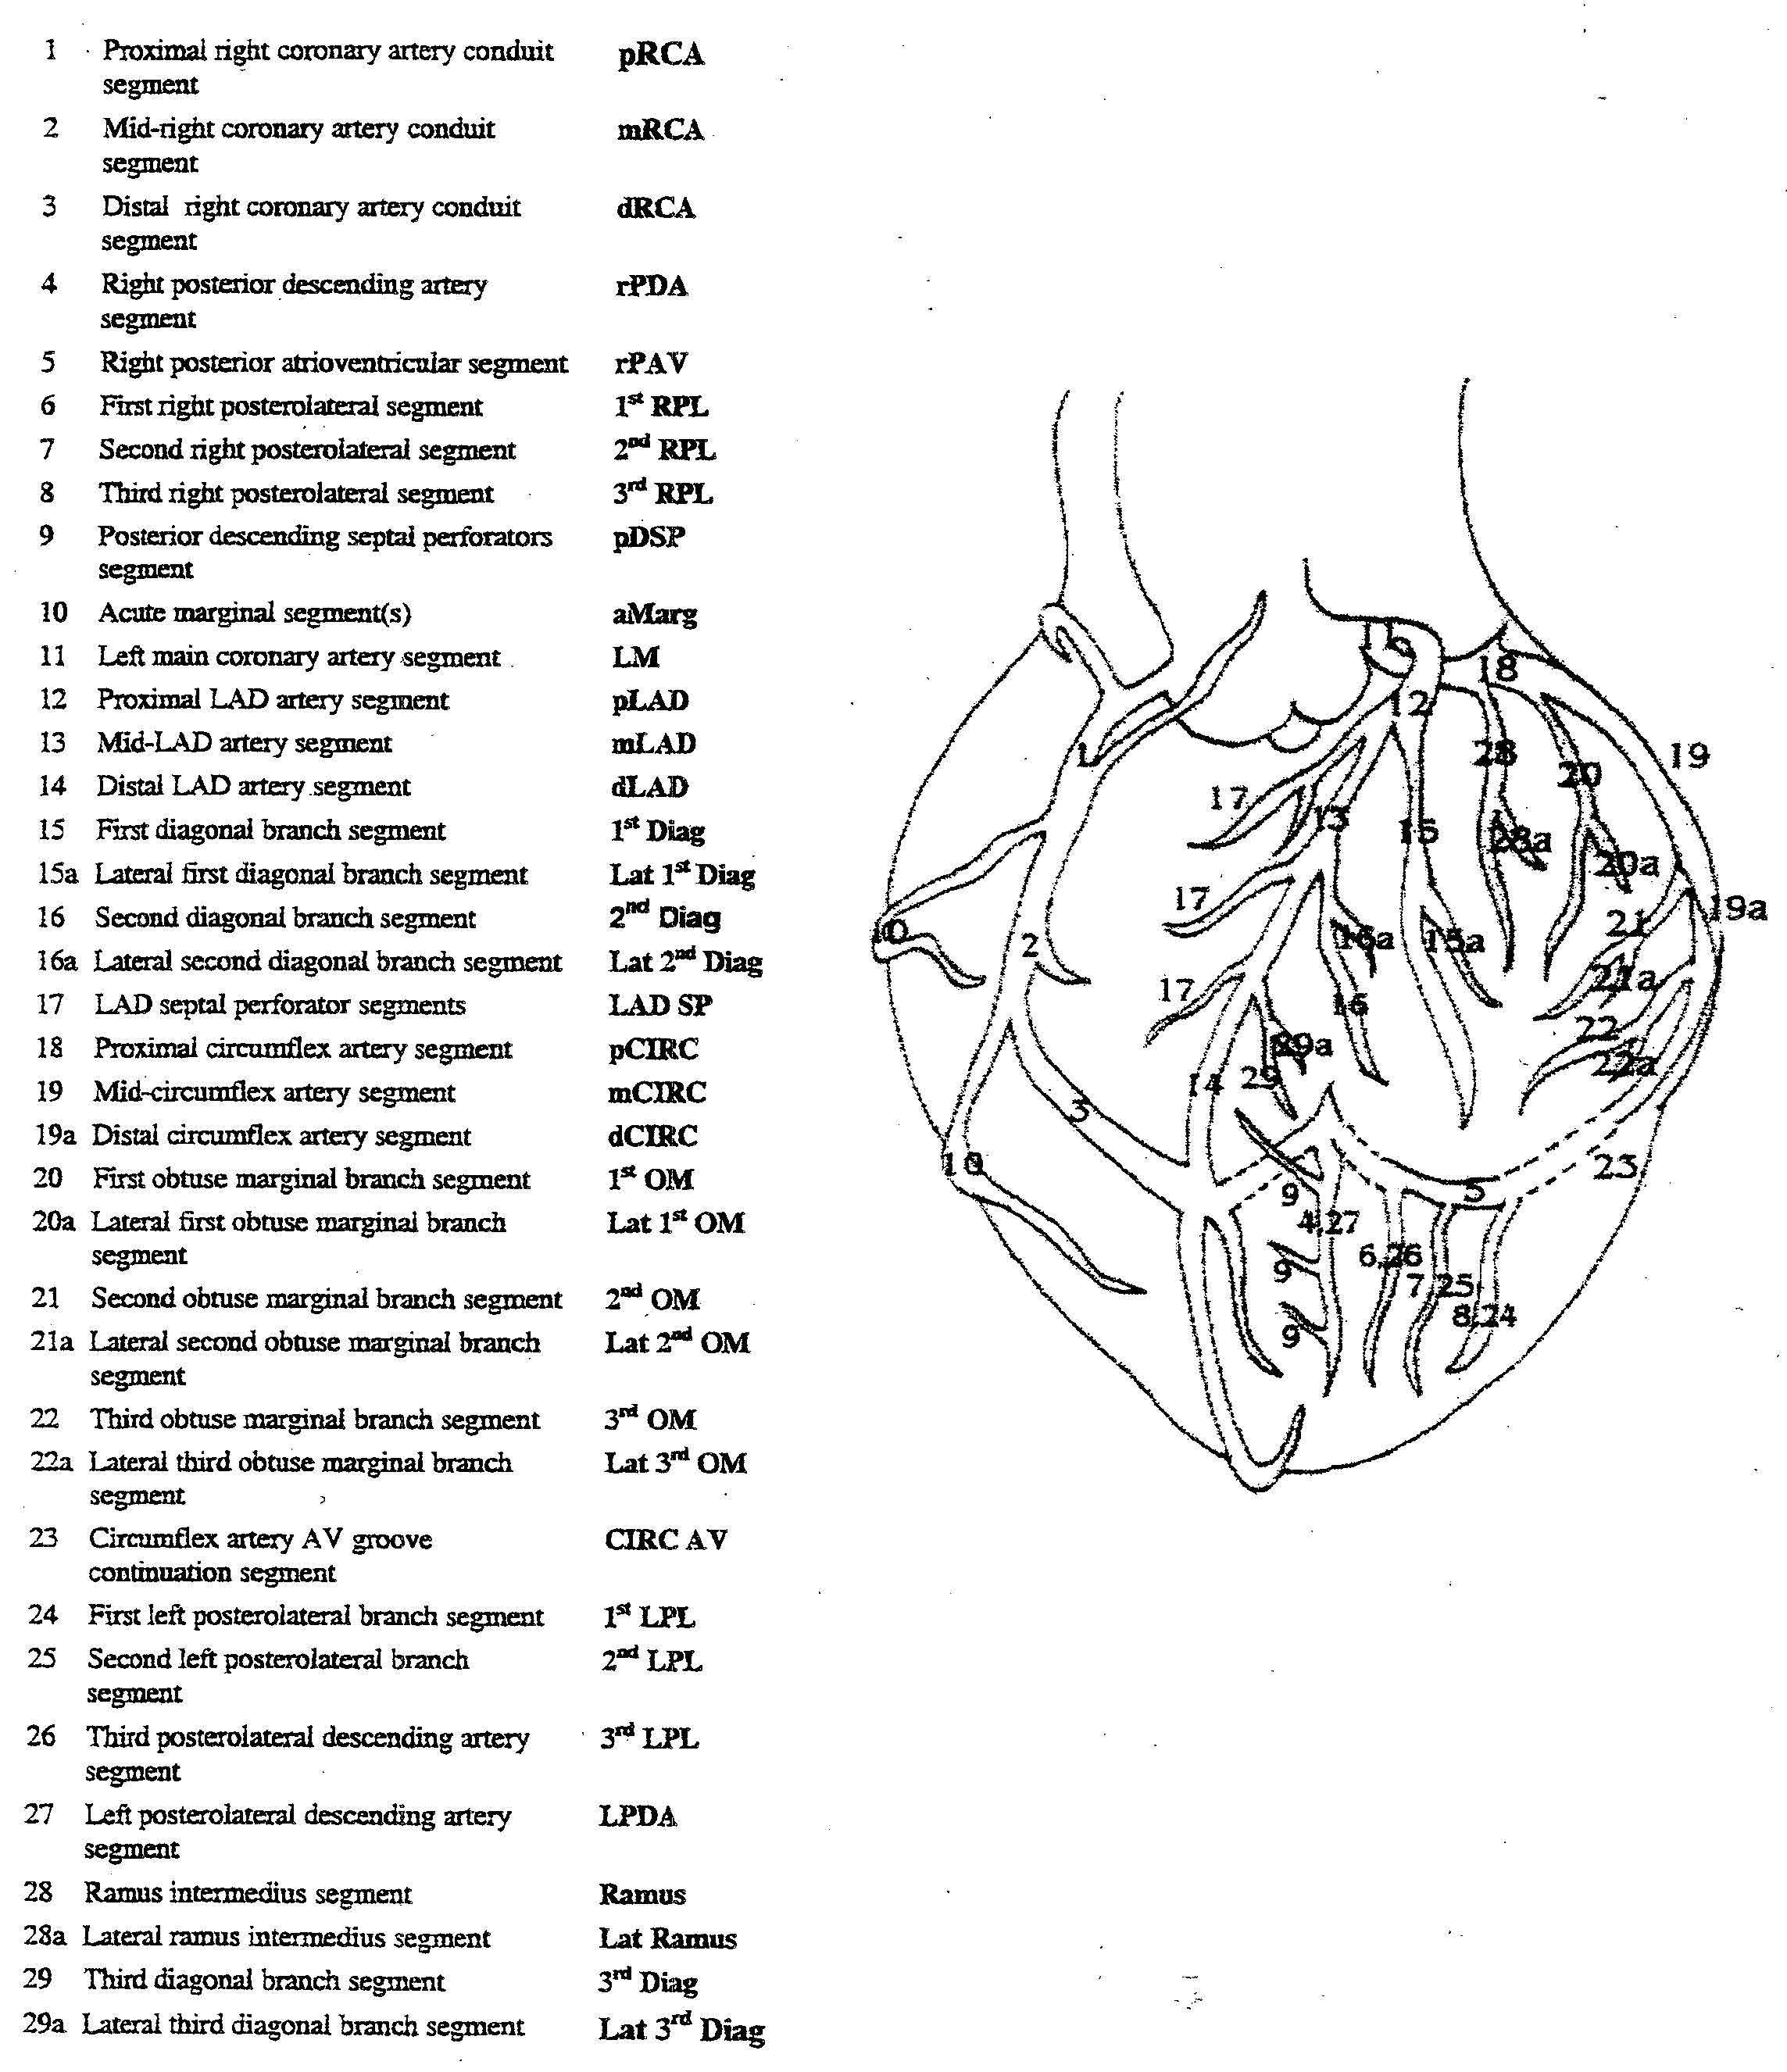 coronary artery images | Coronary Artery Anatomy | Medical Reference ...